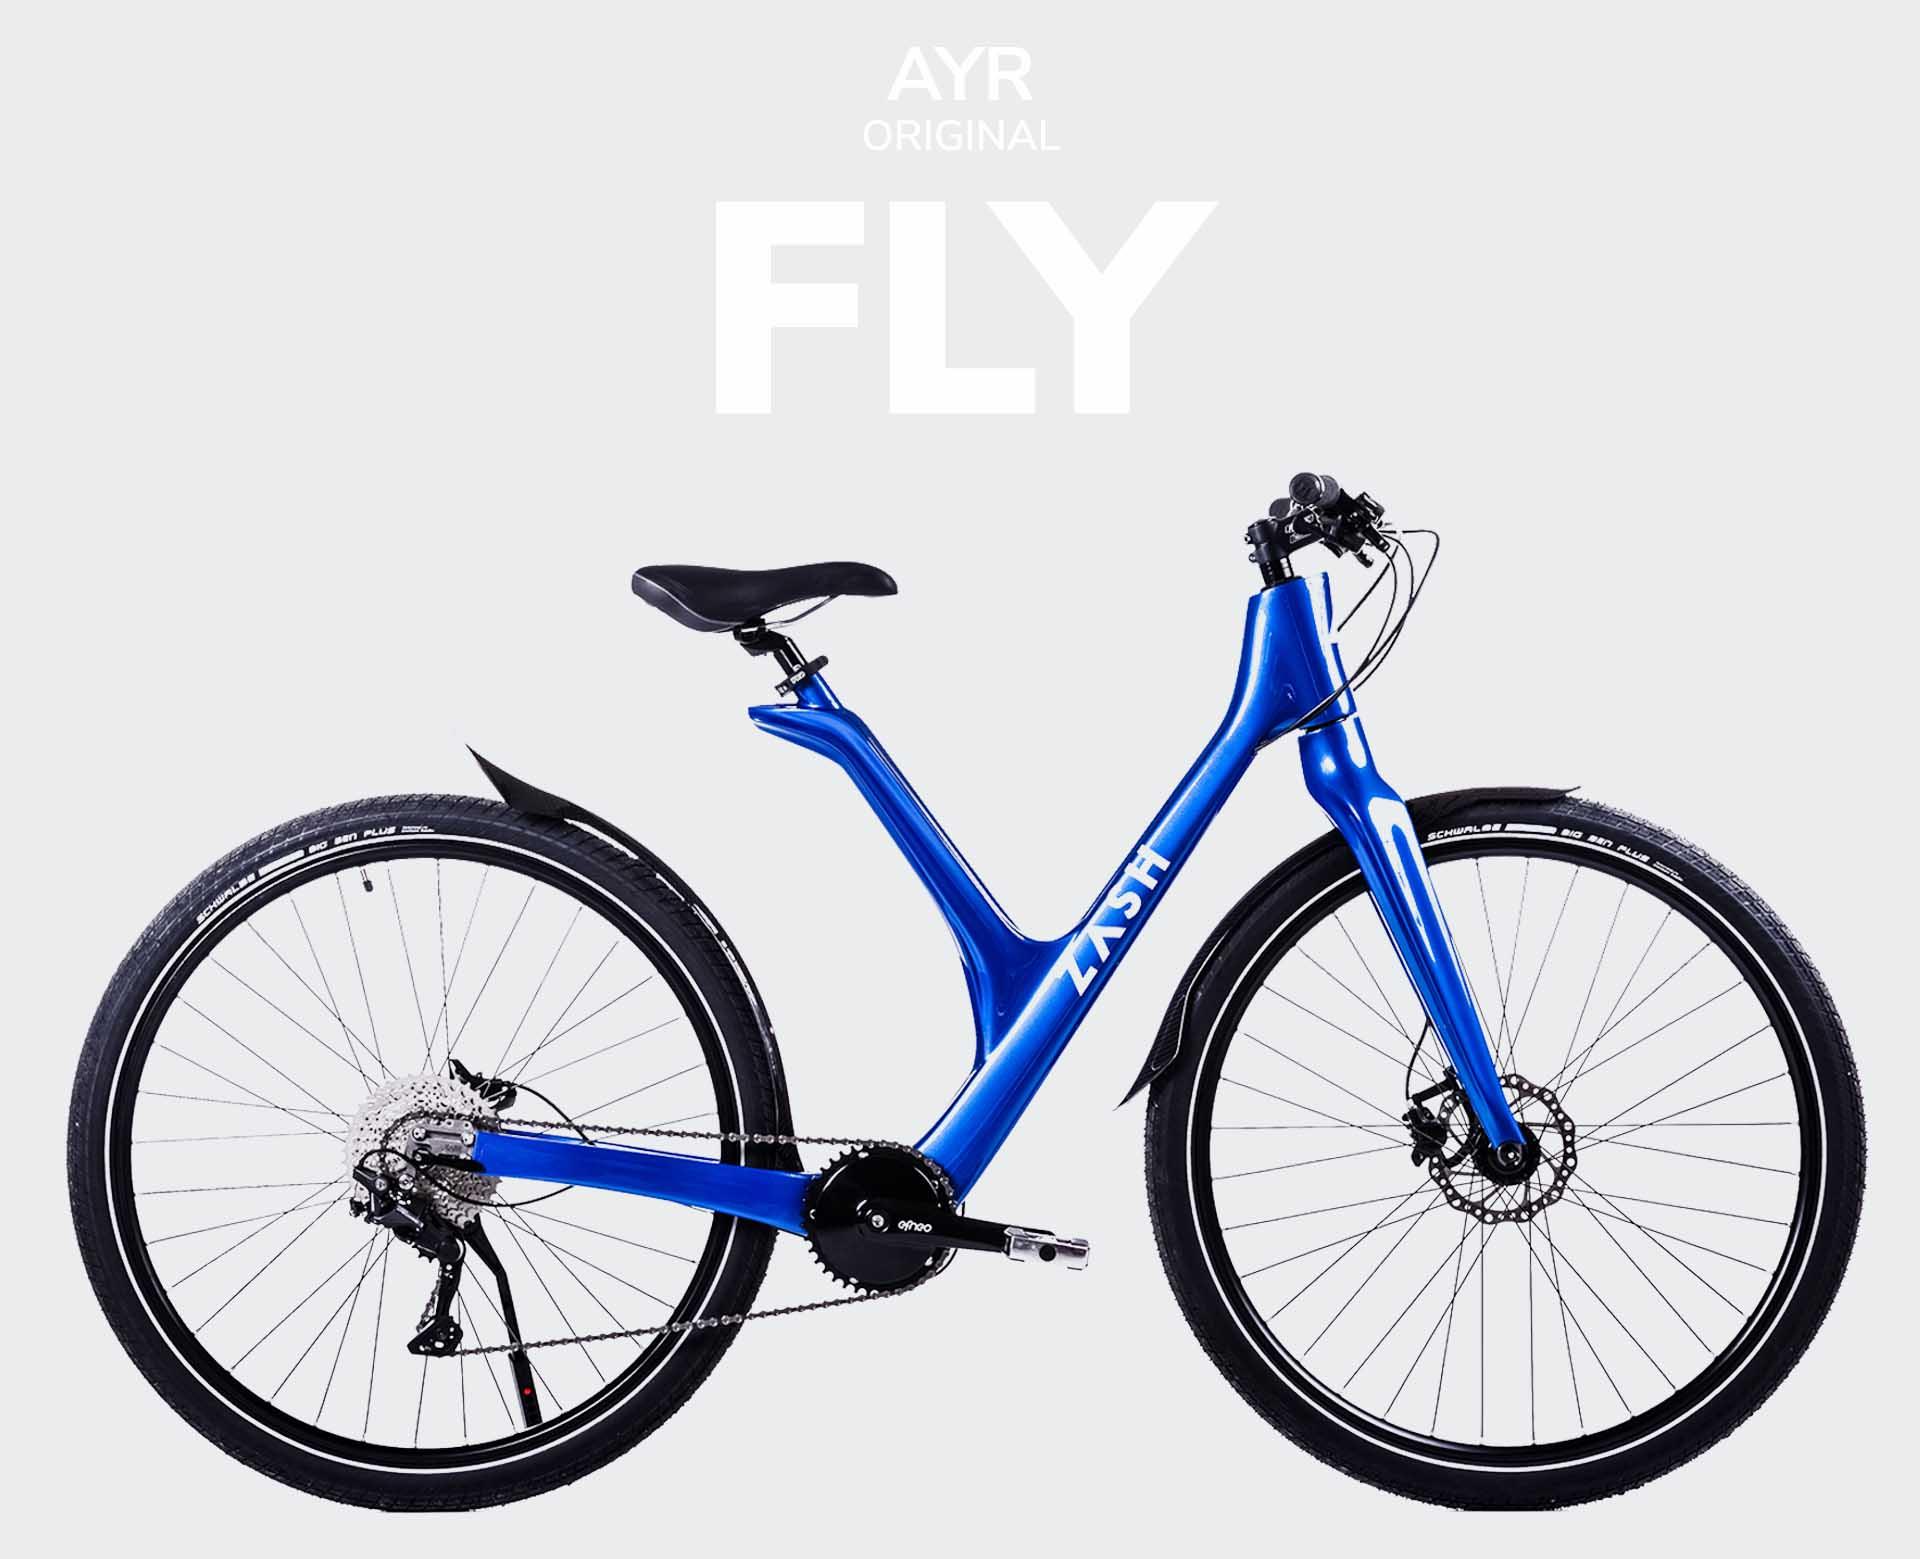 fly zash original